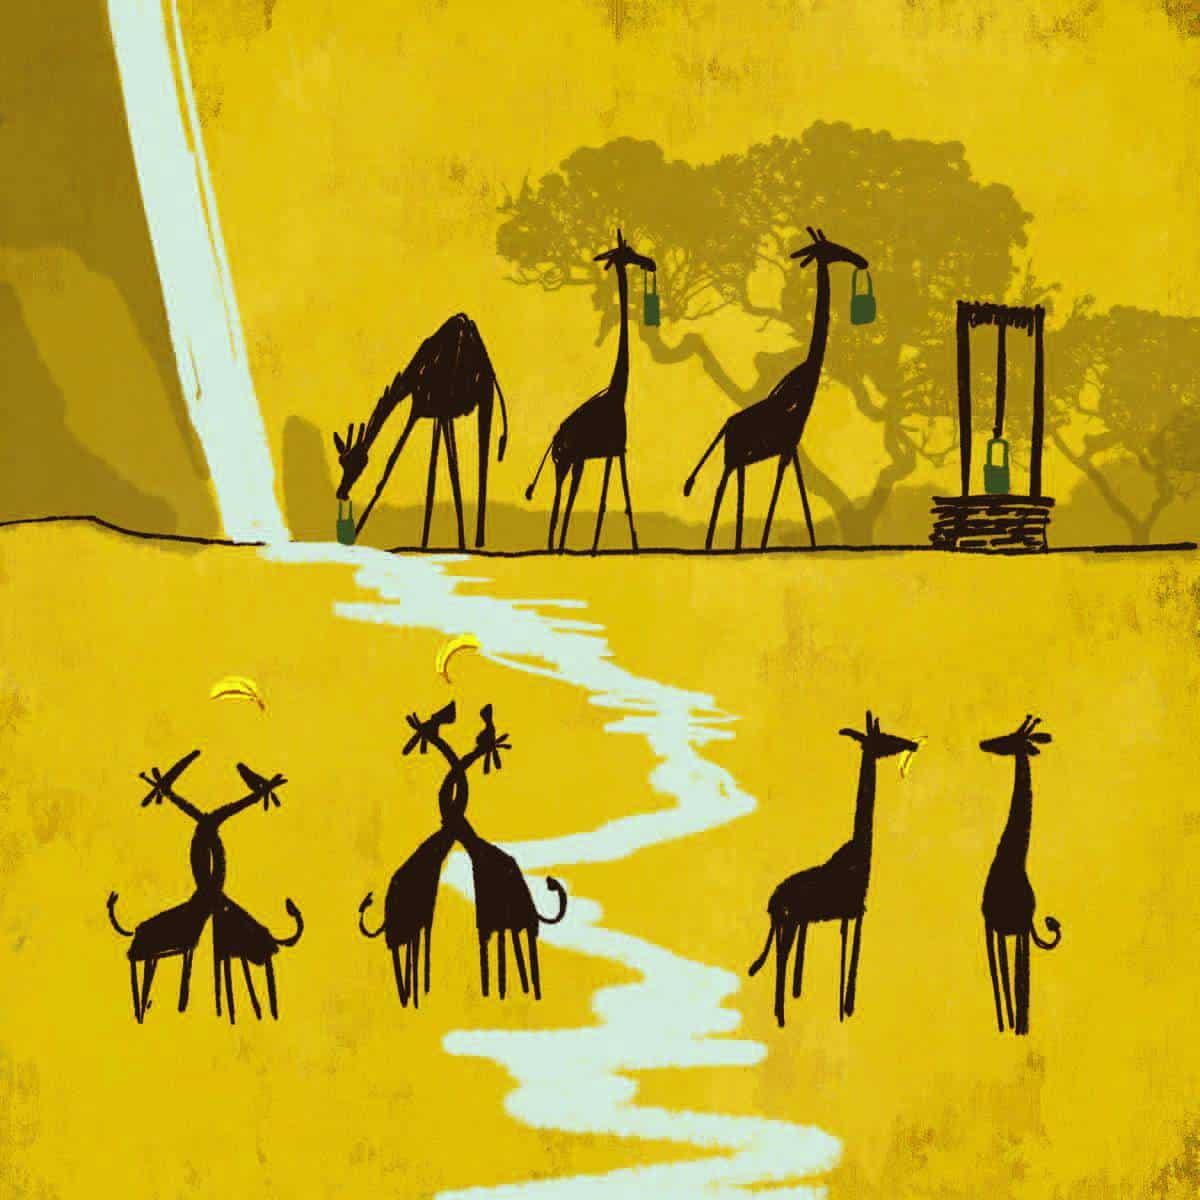 Gordon-the-Giraffe-image-04